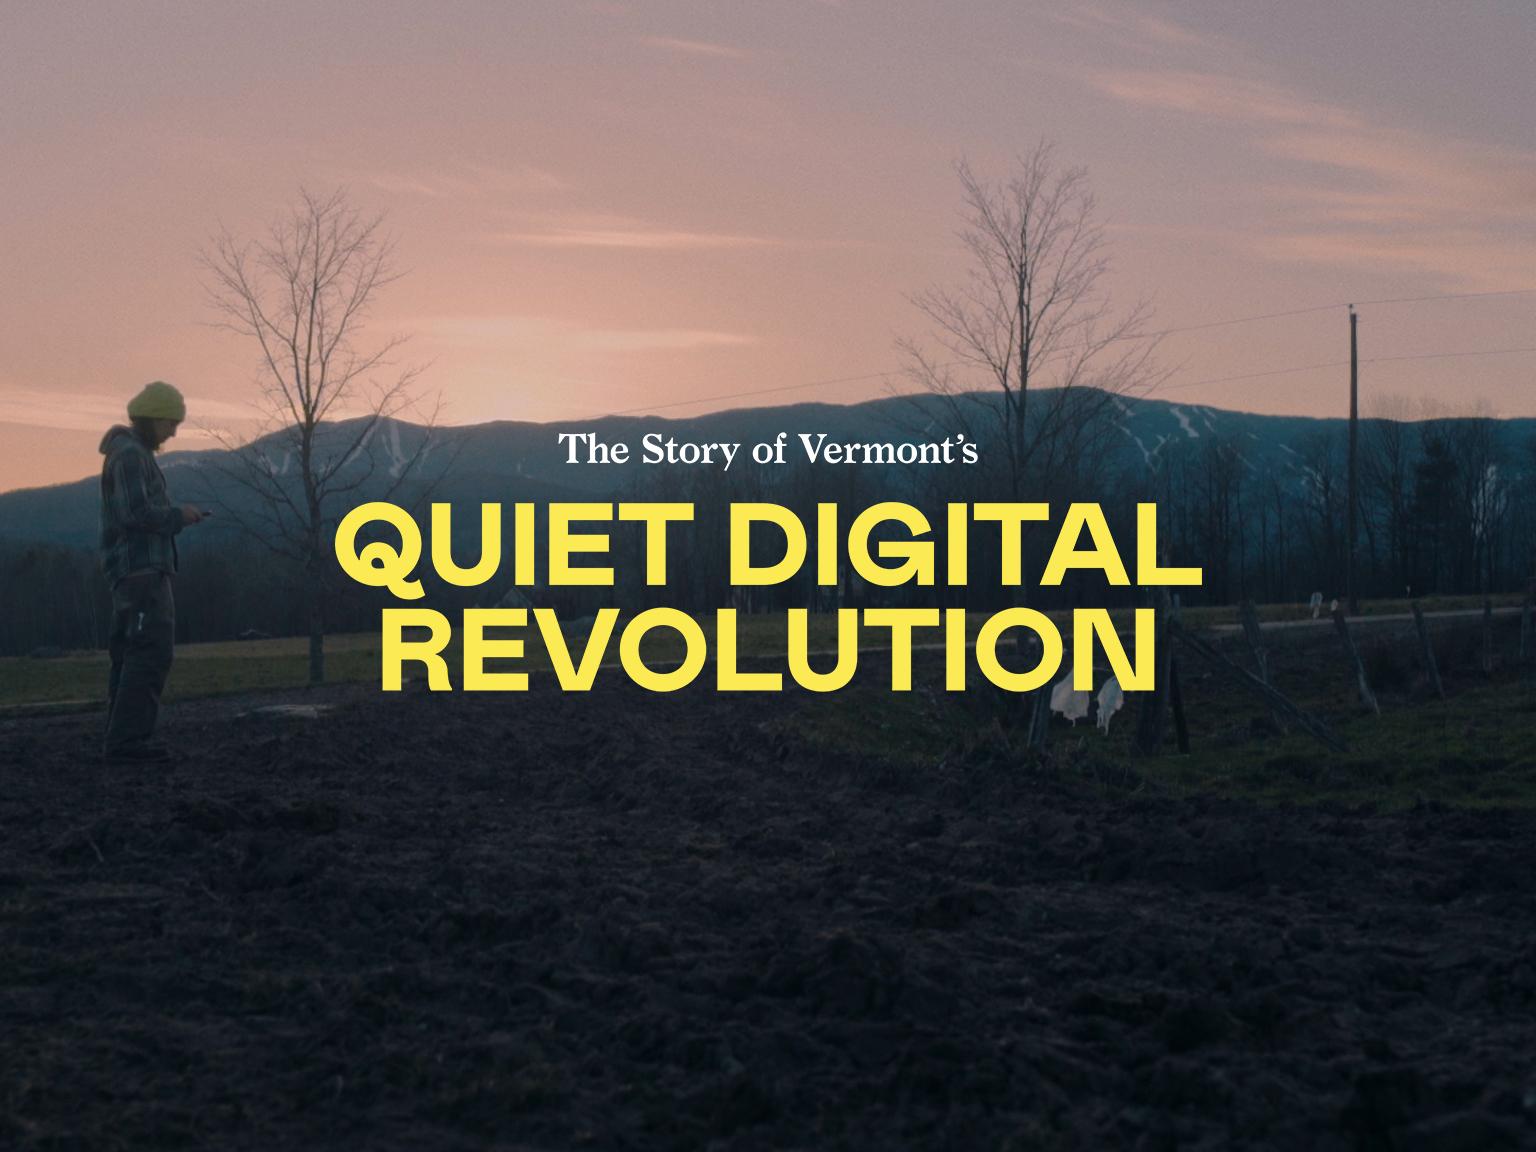 Vermont's Quiet Digital Revolution social media tech technology rural story storytelling filmmaking documentary film festival text font type typography video film